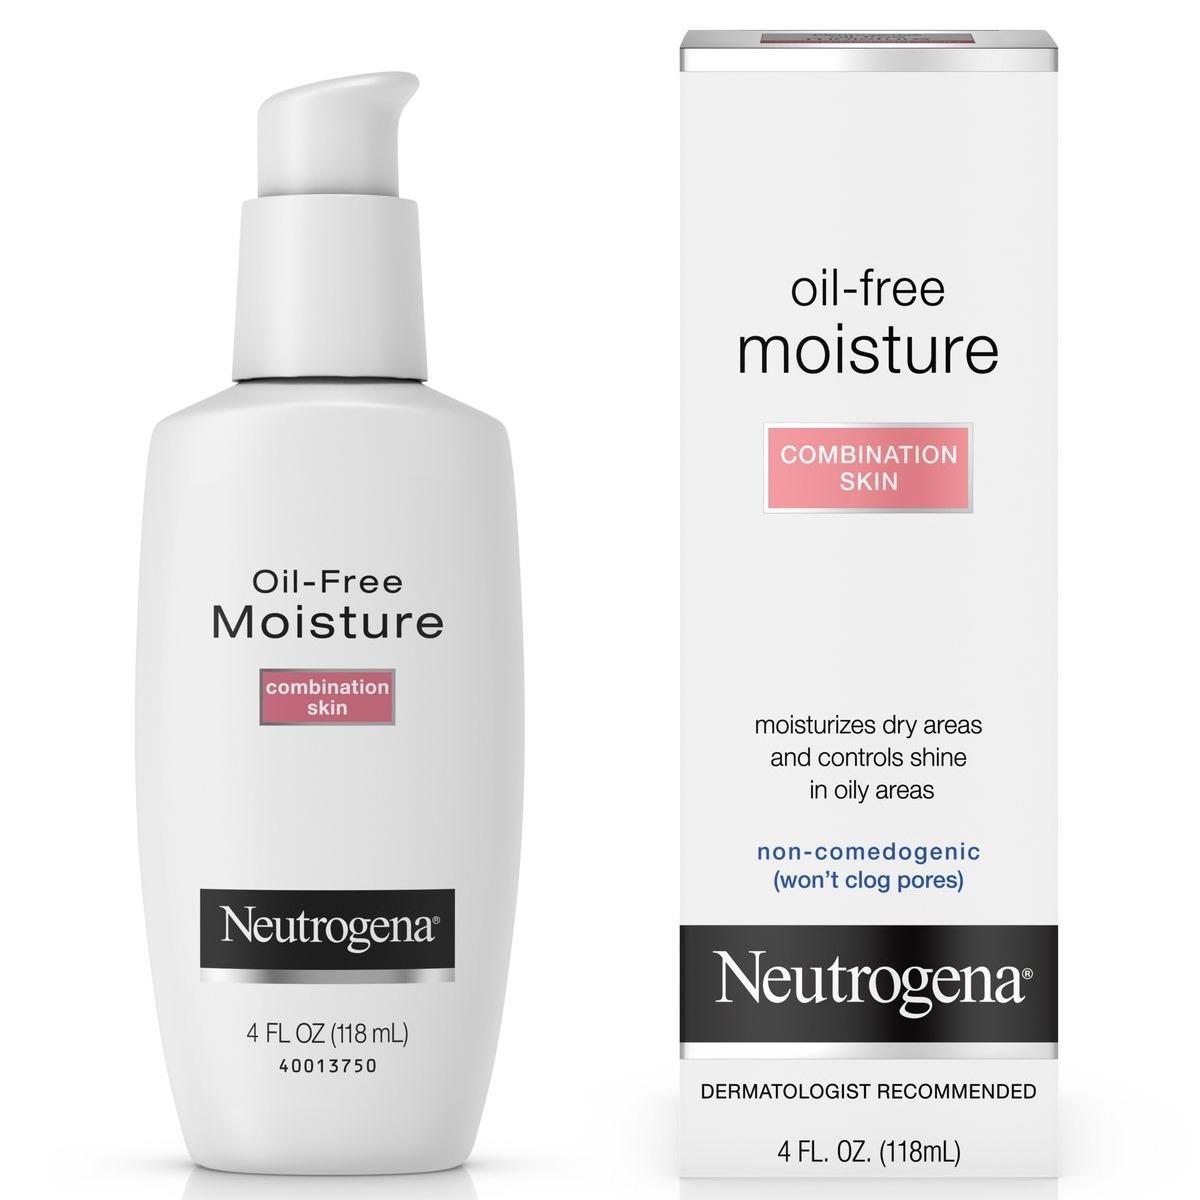 Neutrogena Oil-Free Moisture-Combination Skin